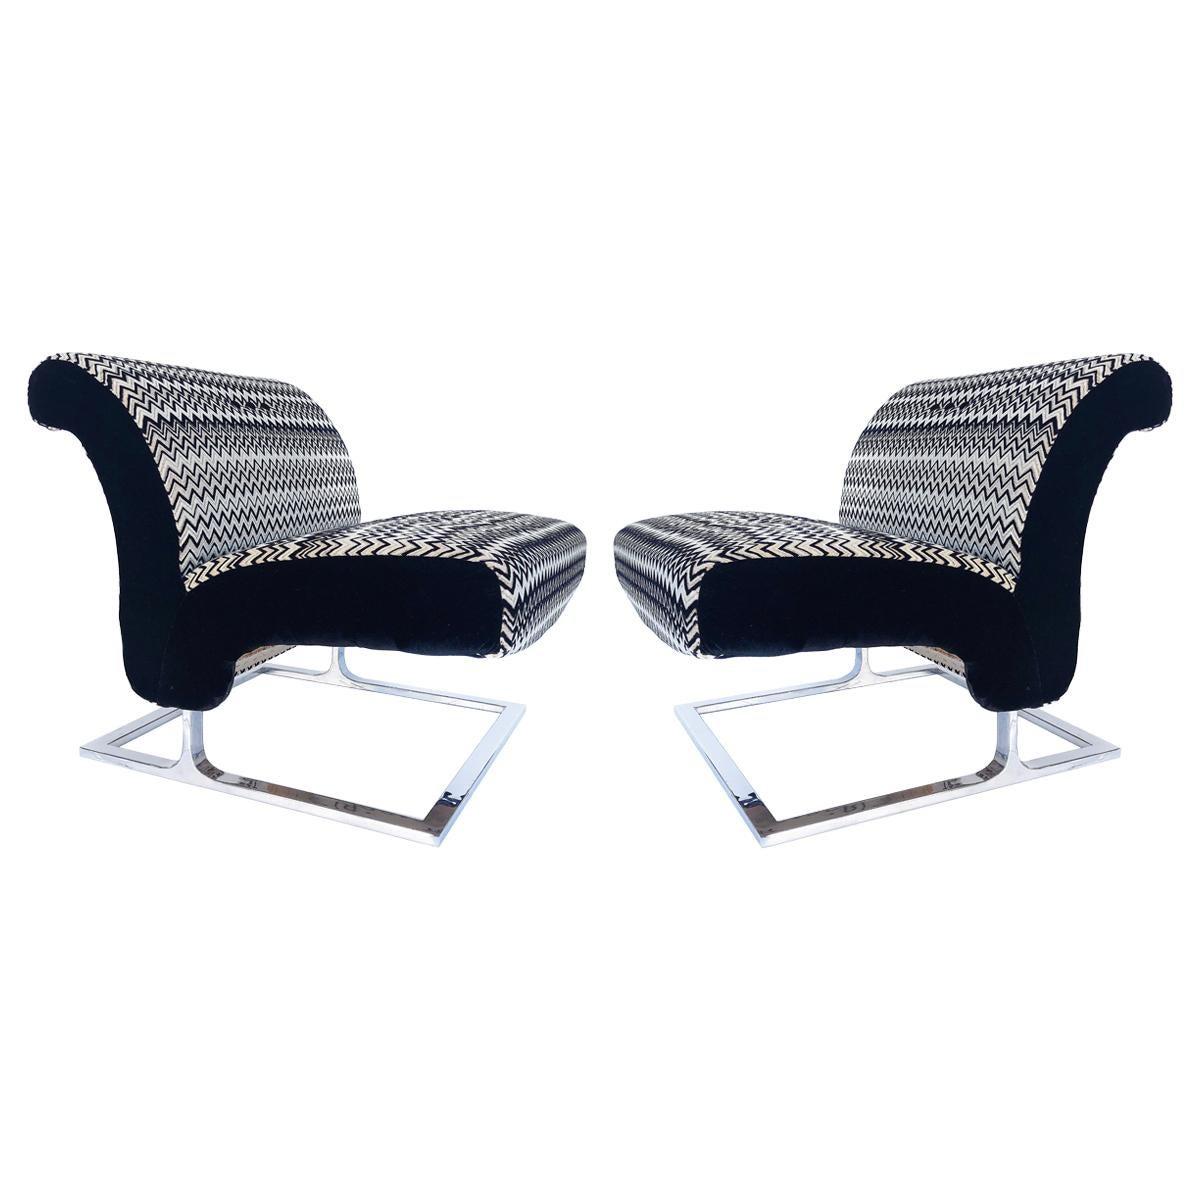 Mid-Century Modern Stainless Upholstered Slipper Chairs, Pair